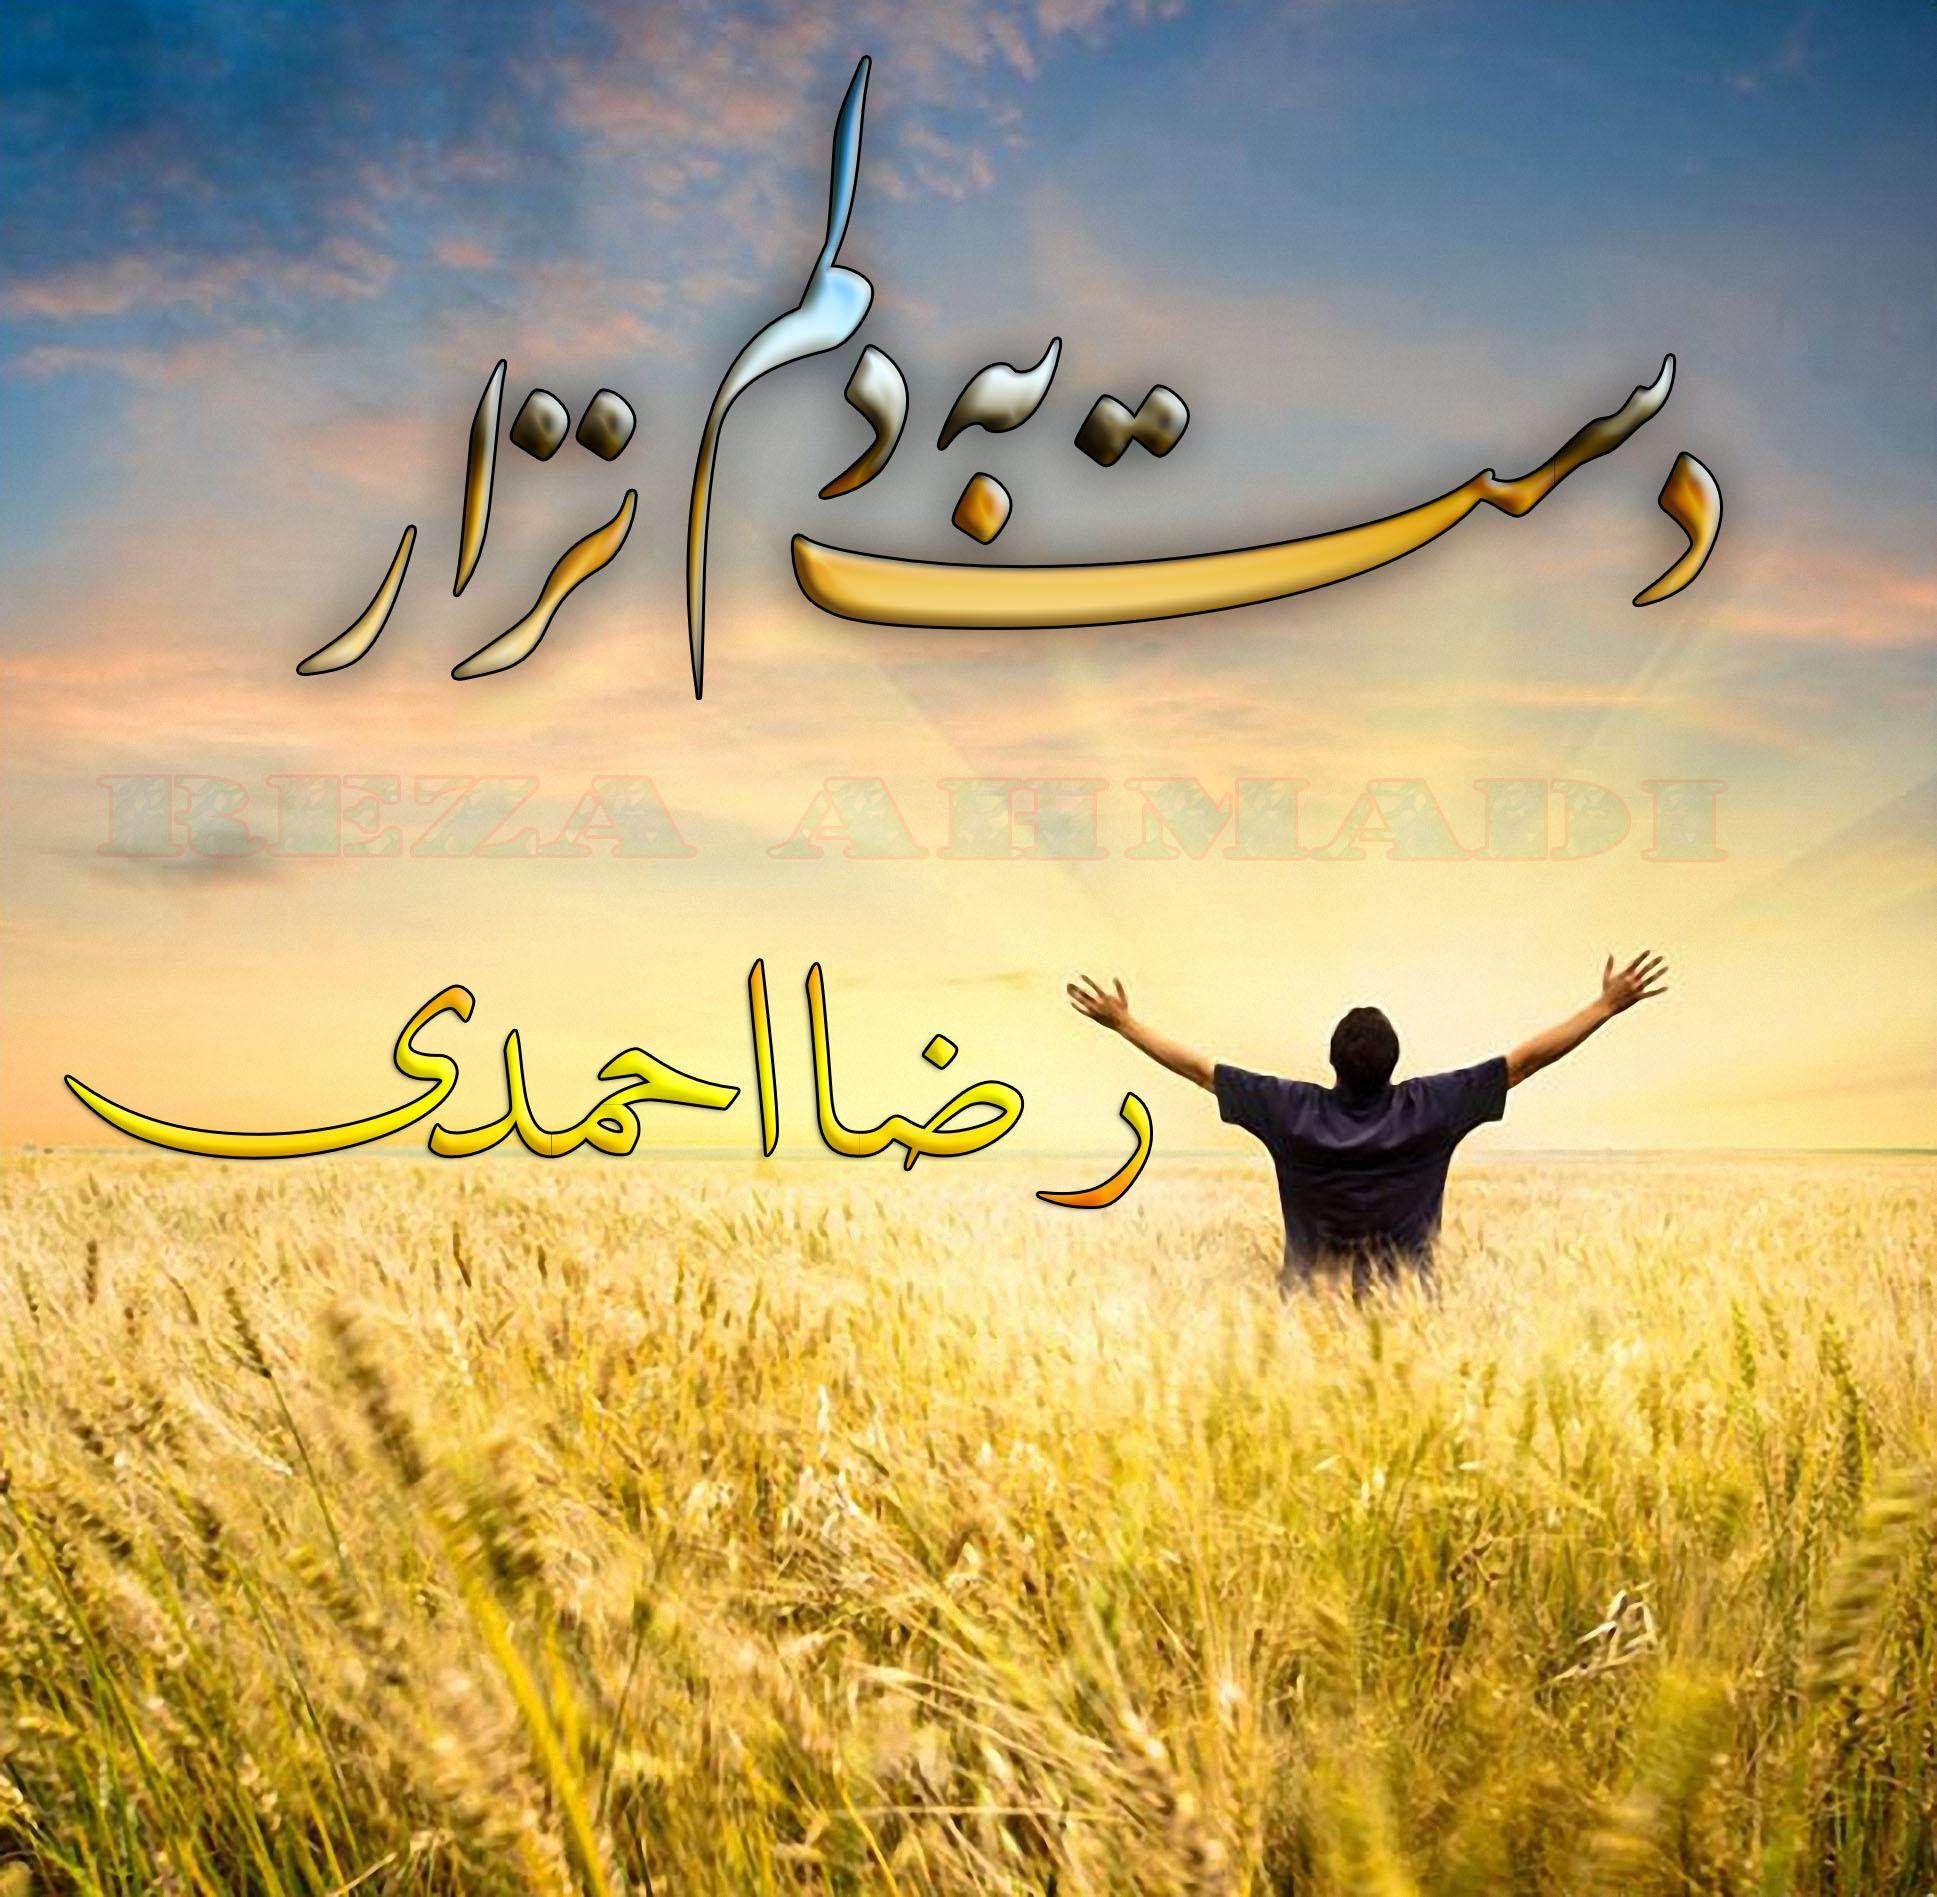 Reza_Ahmadi_Dast_Be_Delam_Nazar_.jpg